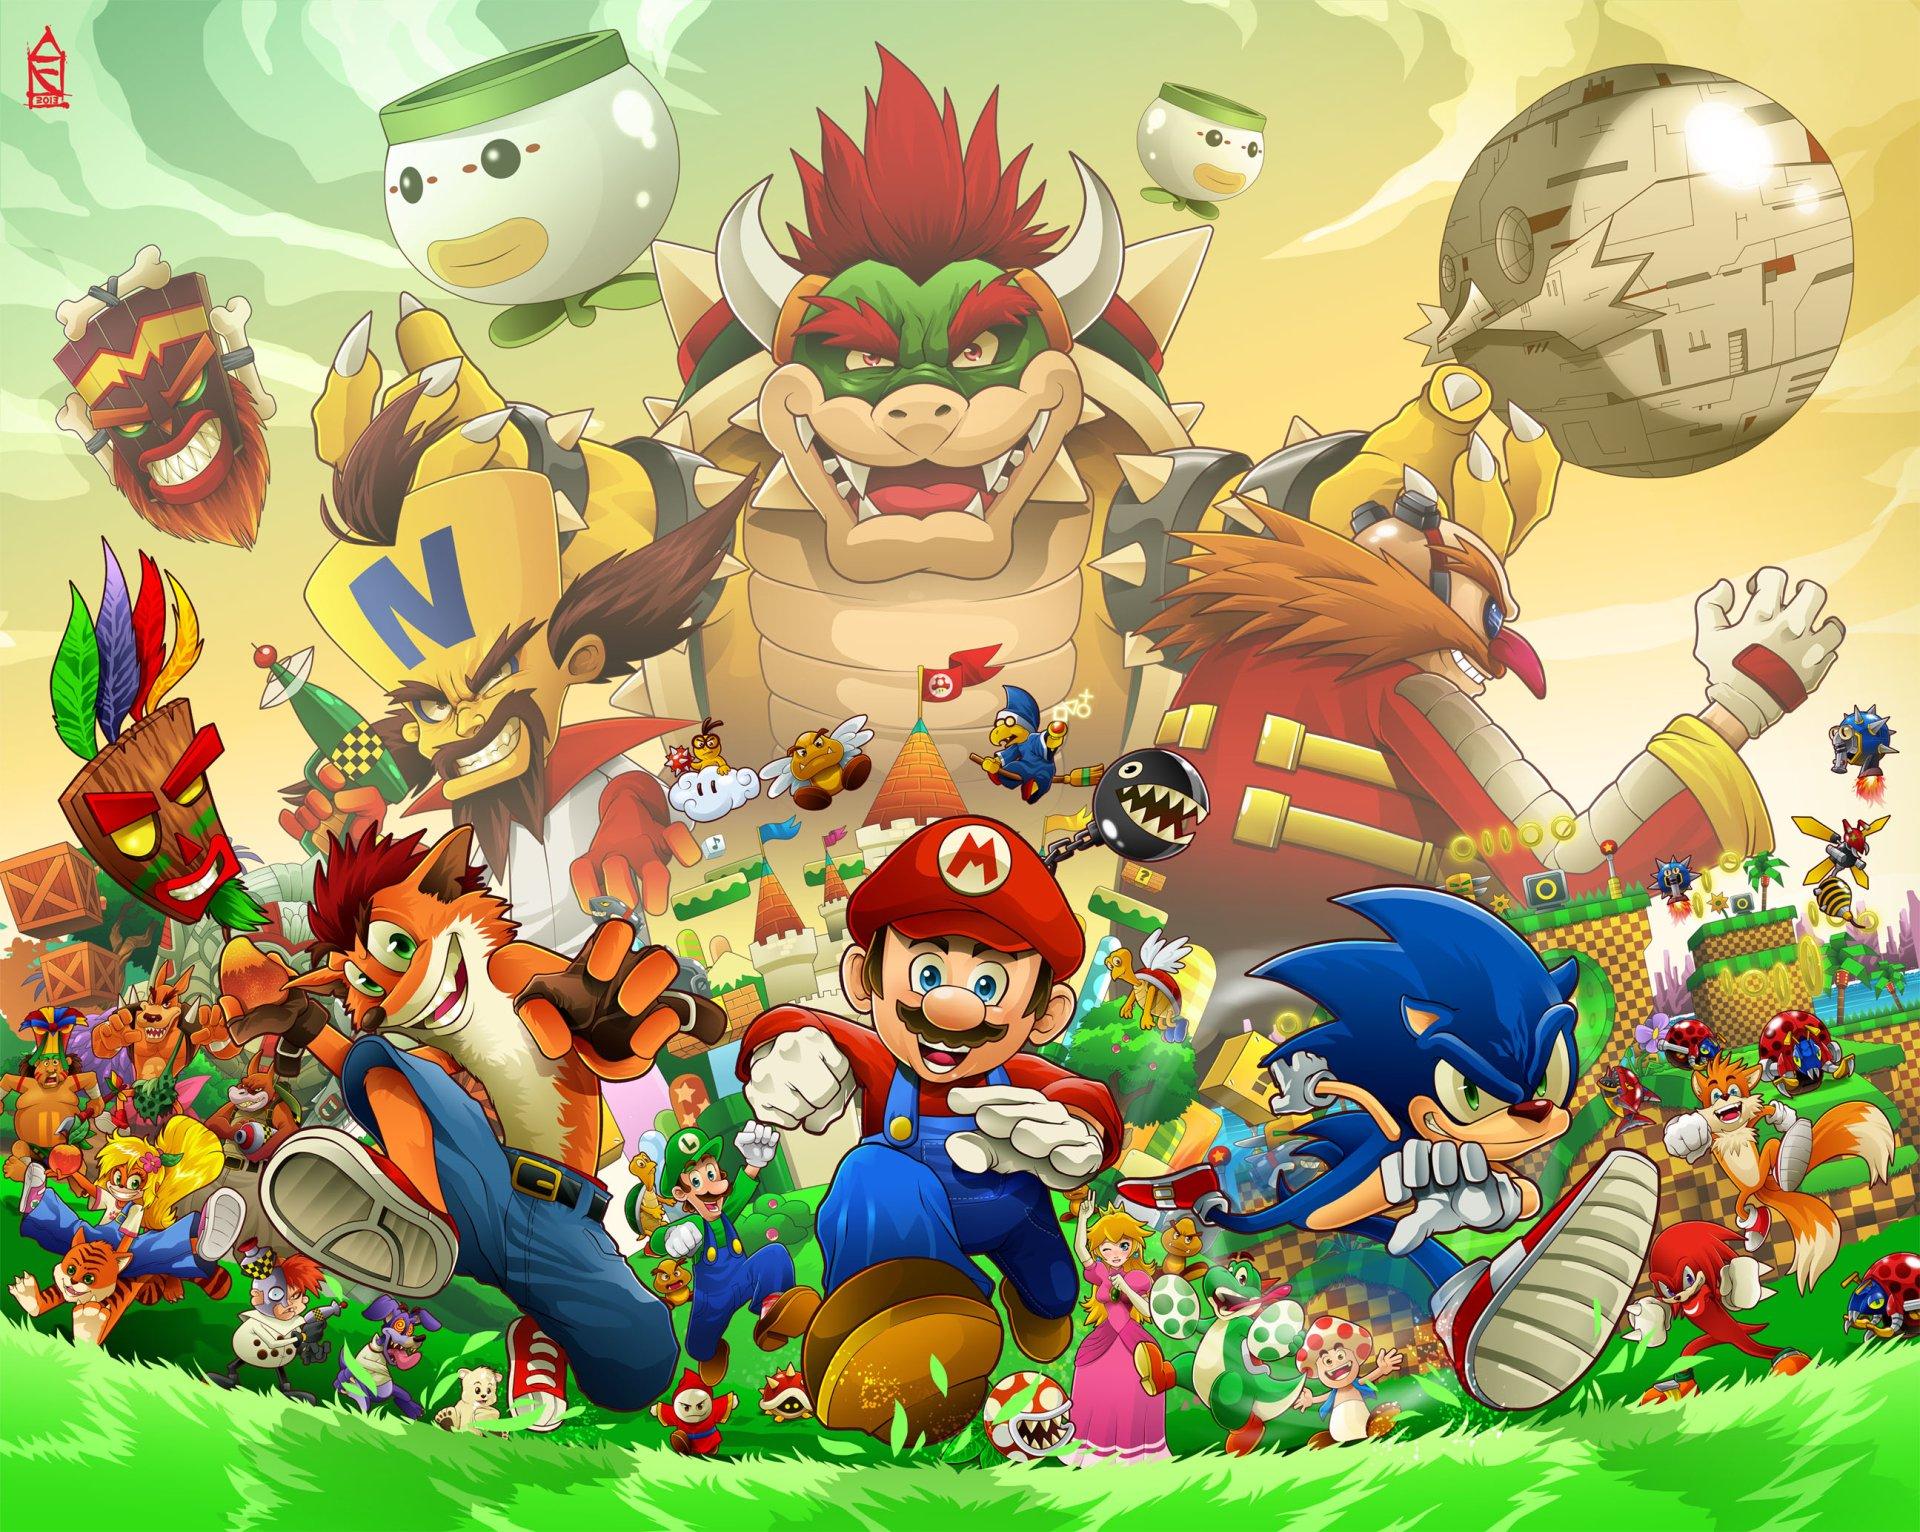 Video Game - Crossover  Bowser Mario Sega Nintendo Sony Sonic the Hedgehog Super Mario Bros Crash Bandicoot (Character) Wallpaper